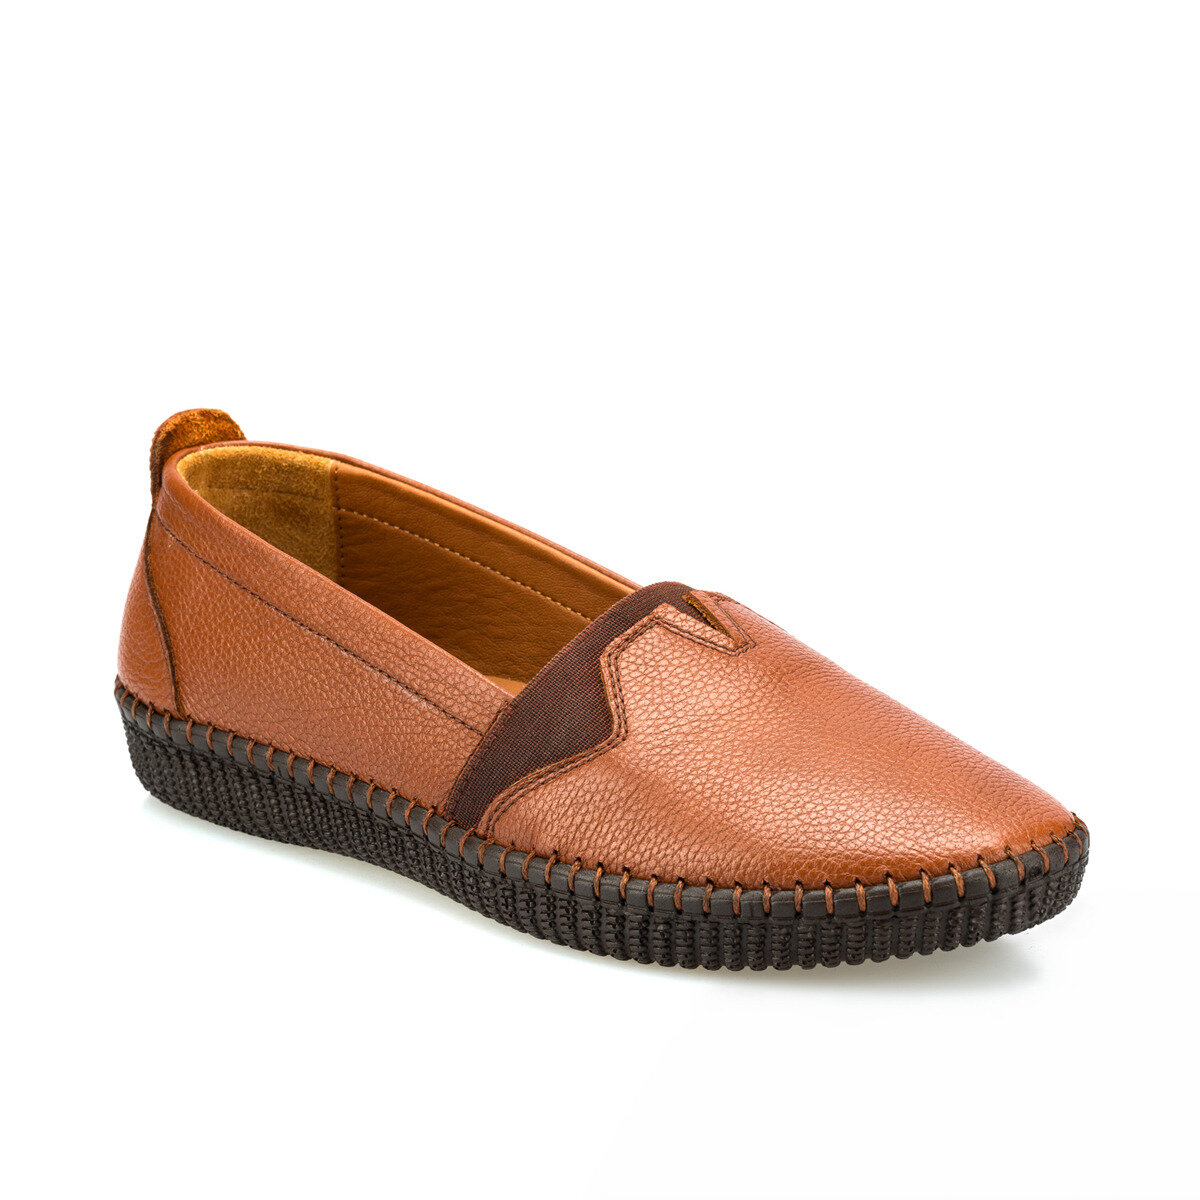 FLO 103020.Z Tan Women 'S Shoes Polaris 5 Point